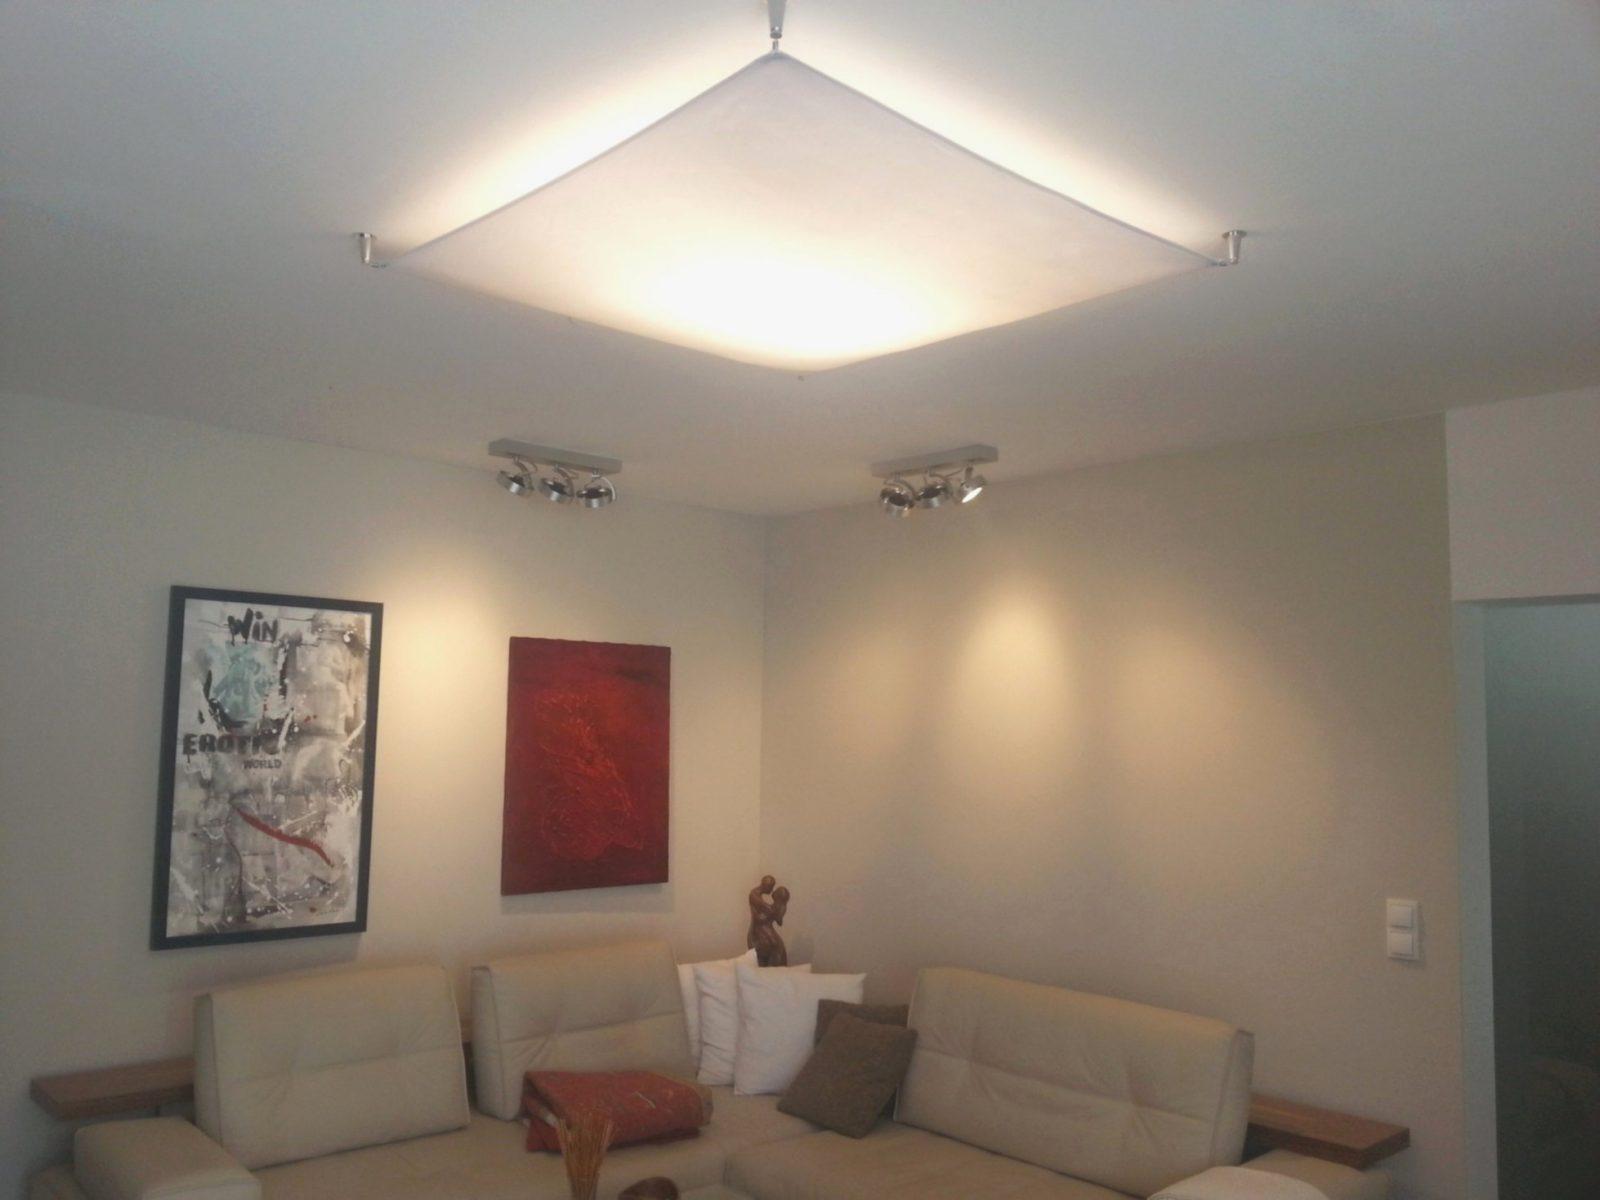 Led Plexiglas Beleuchtung Bauanleitung Elegant  Grundrisse von Led Plexiglas Beleuchtung Bauanleitung Bild